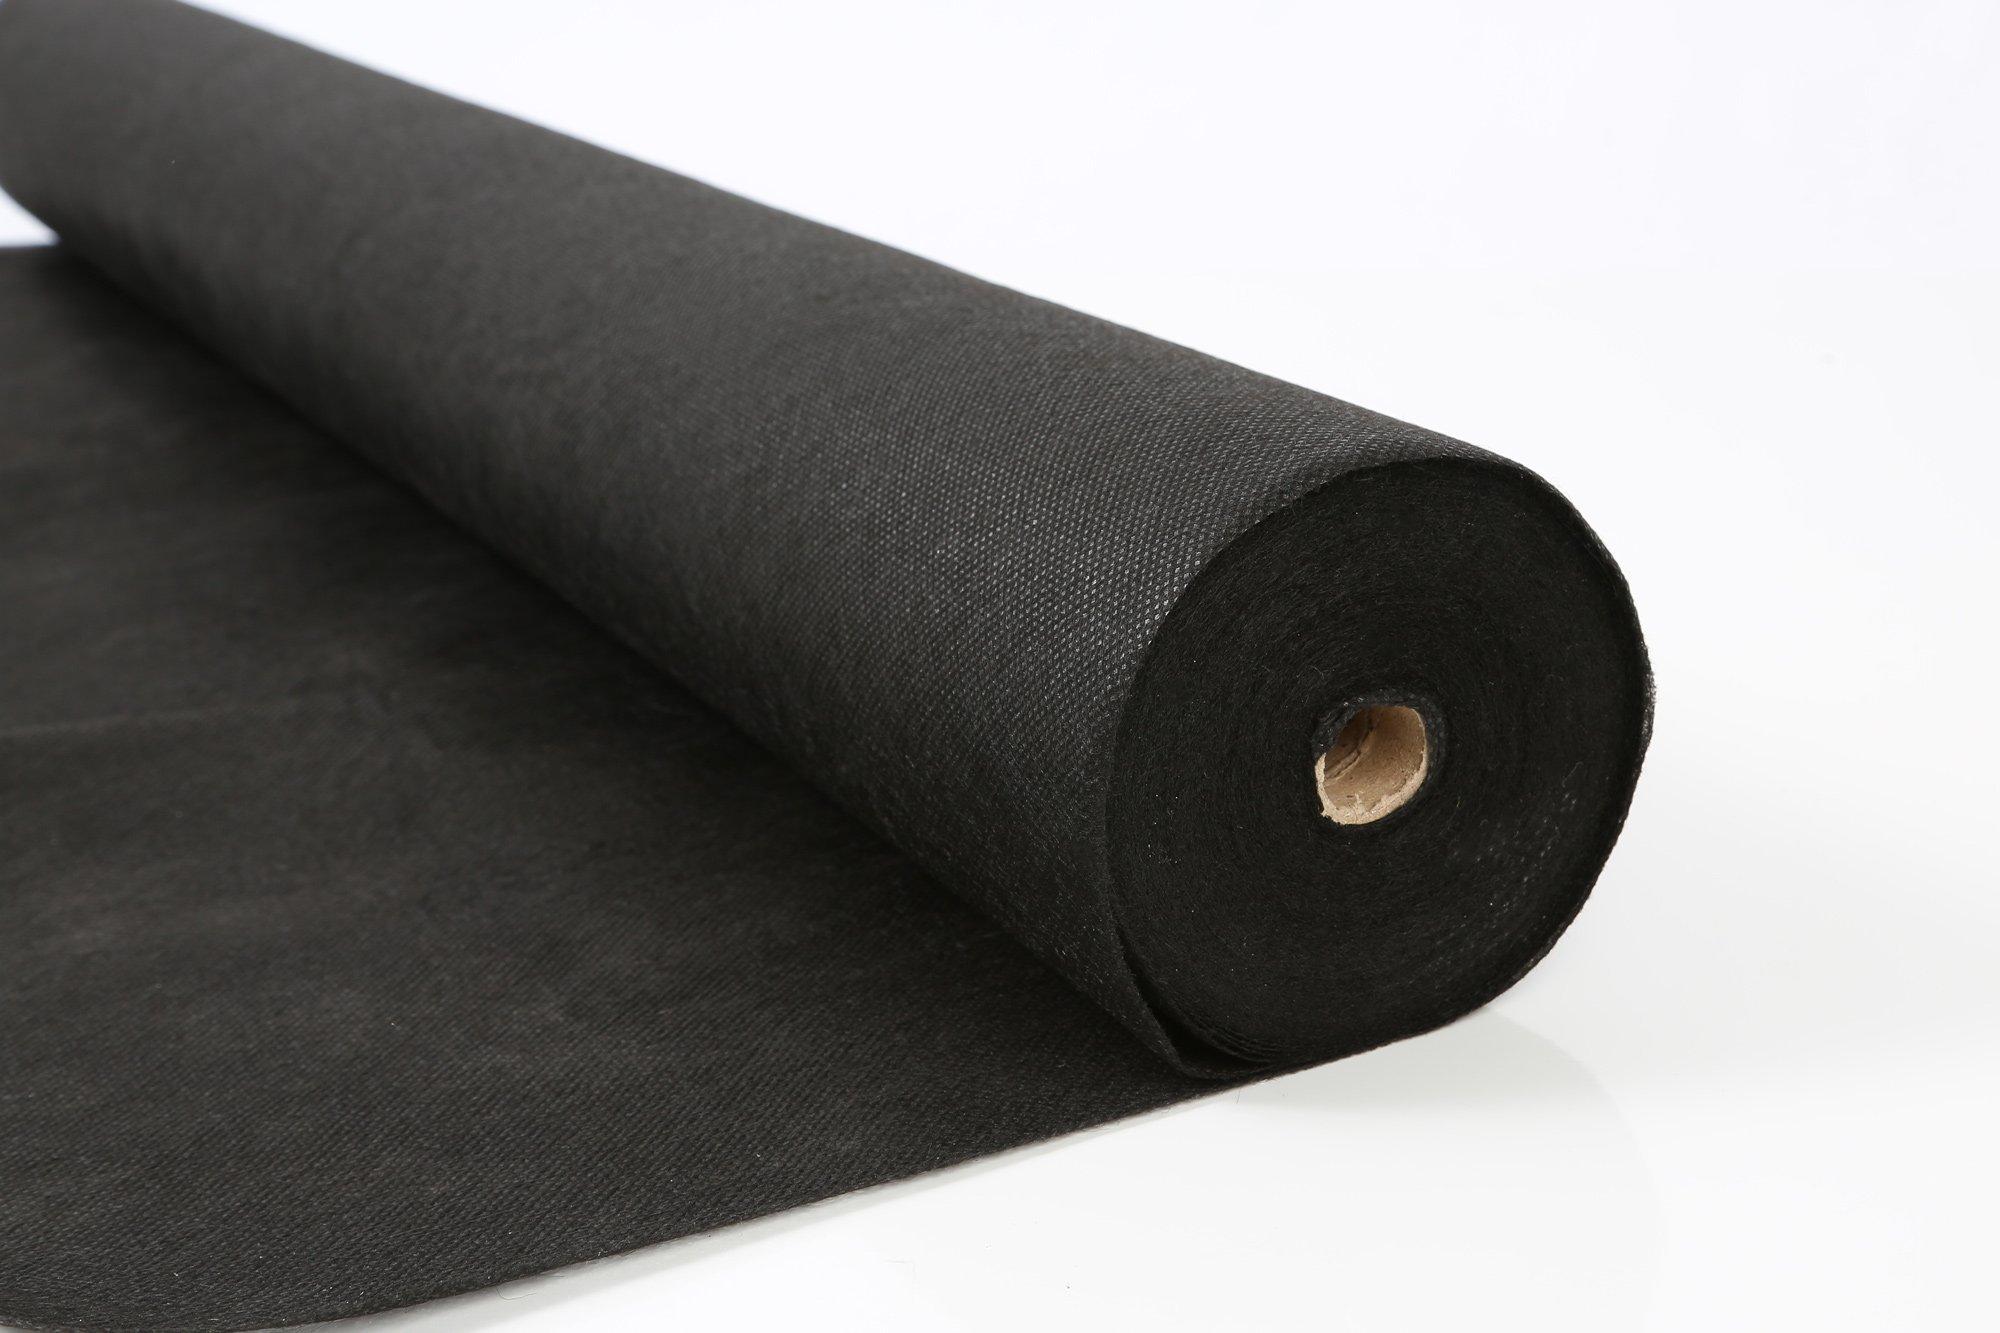 AHG Landscape Garden Fabric for Weeds 3ft x 300ft / 20 YR Premium Series, 3 Feet x 300 Feet, Black by AHG